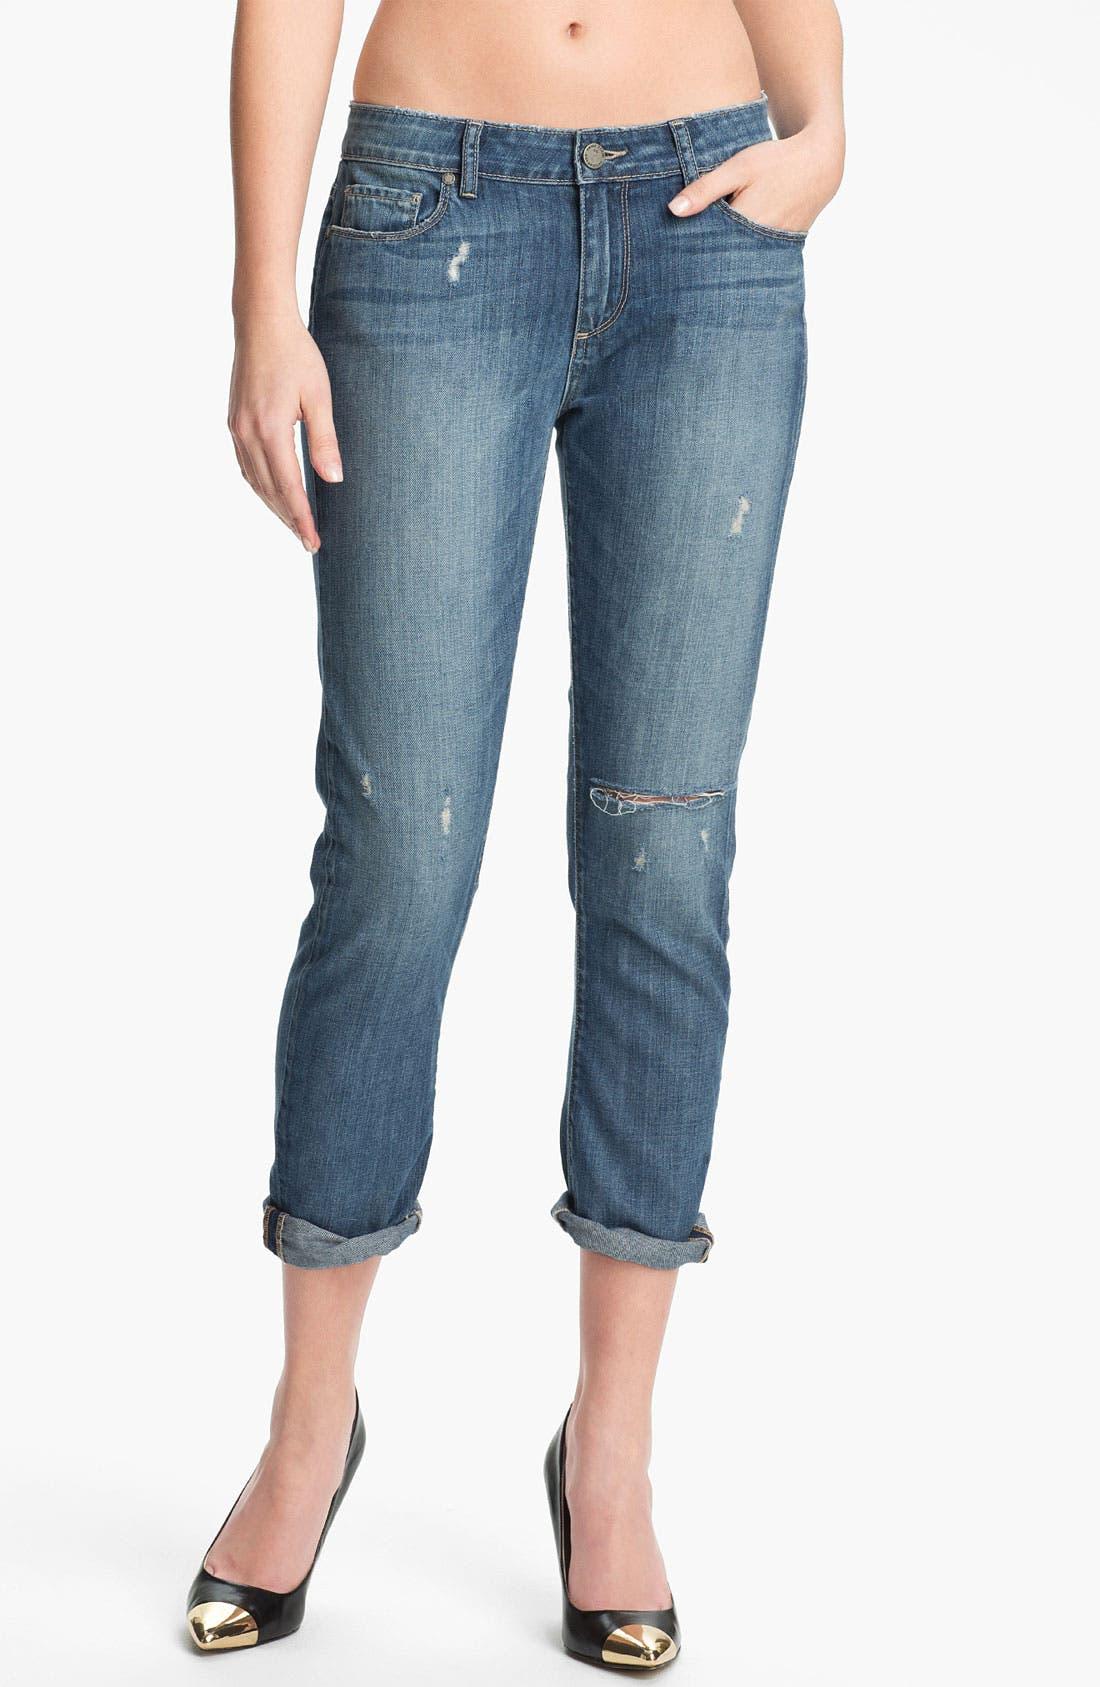 Alternate Image 1 Selected - Paige Denim 'Lydia' Distressed Skinny Jeans (Riley)